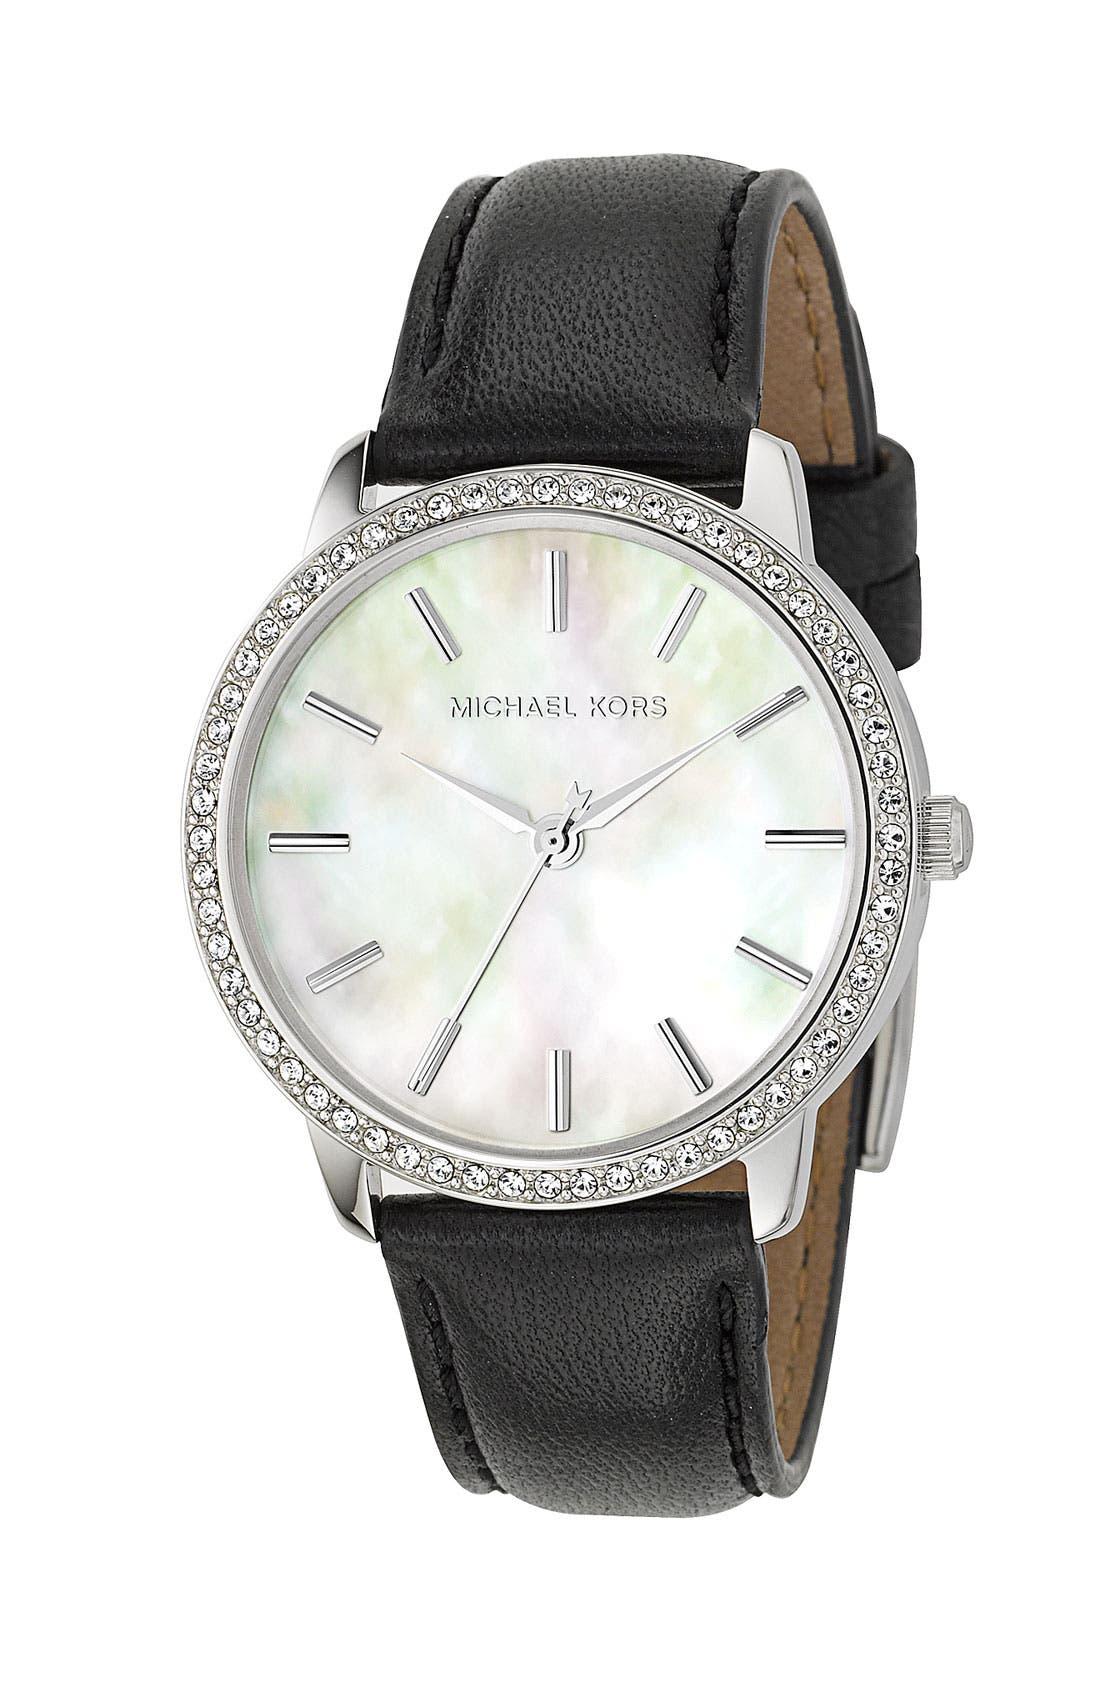 MICHAEL MICHAEL KORS, Michael Kors Crystal Rim Bracelet Watch, Main thumbnail 1, color, 002